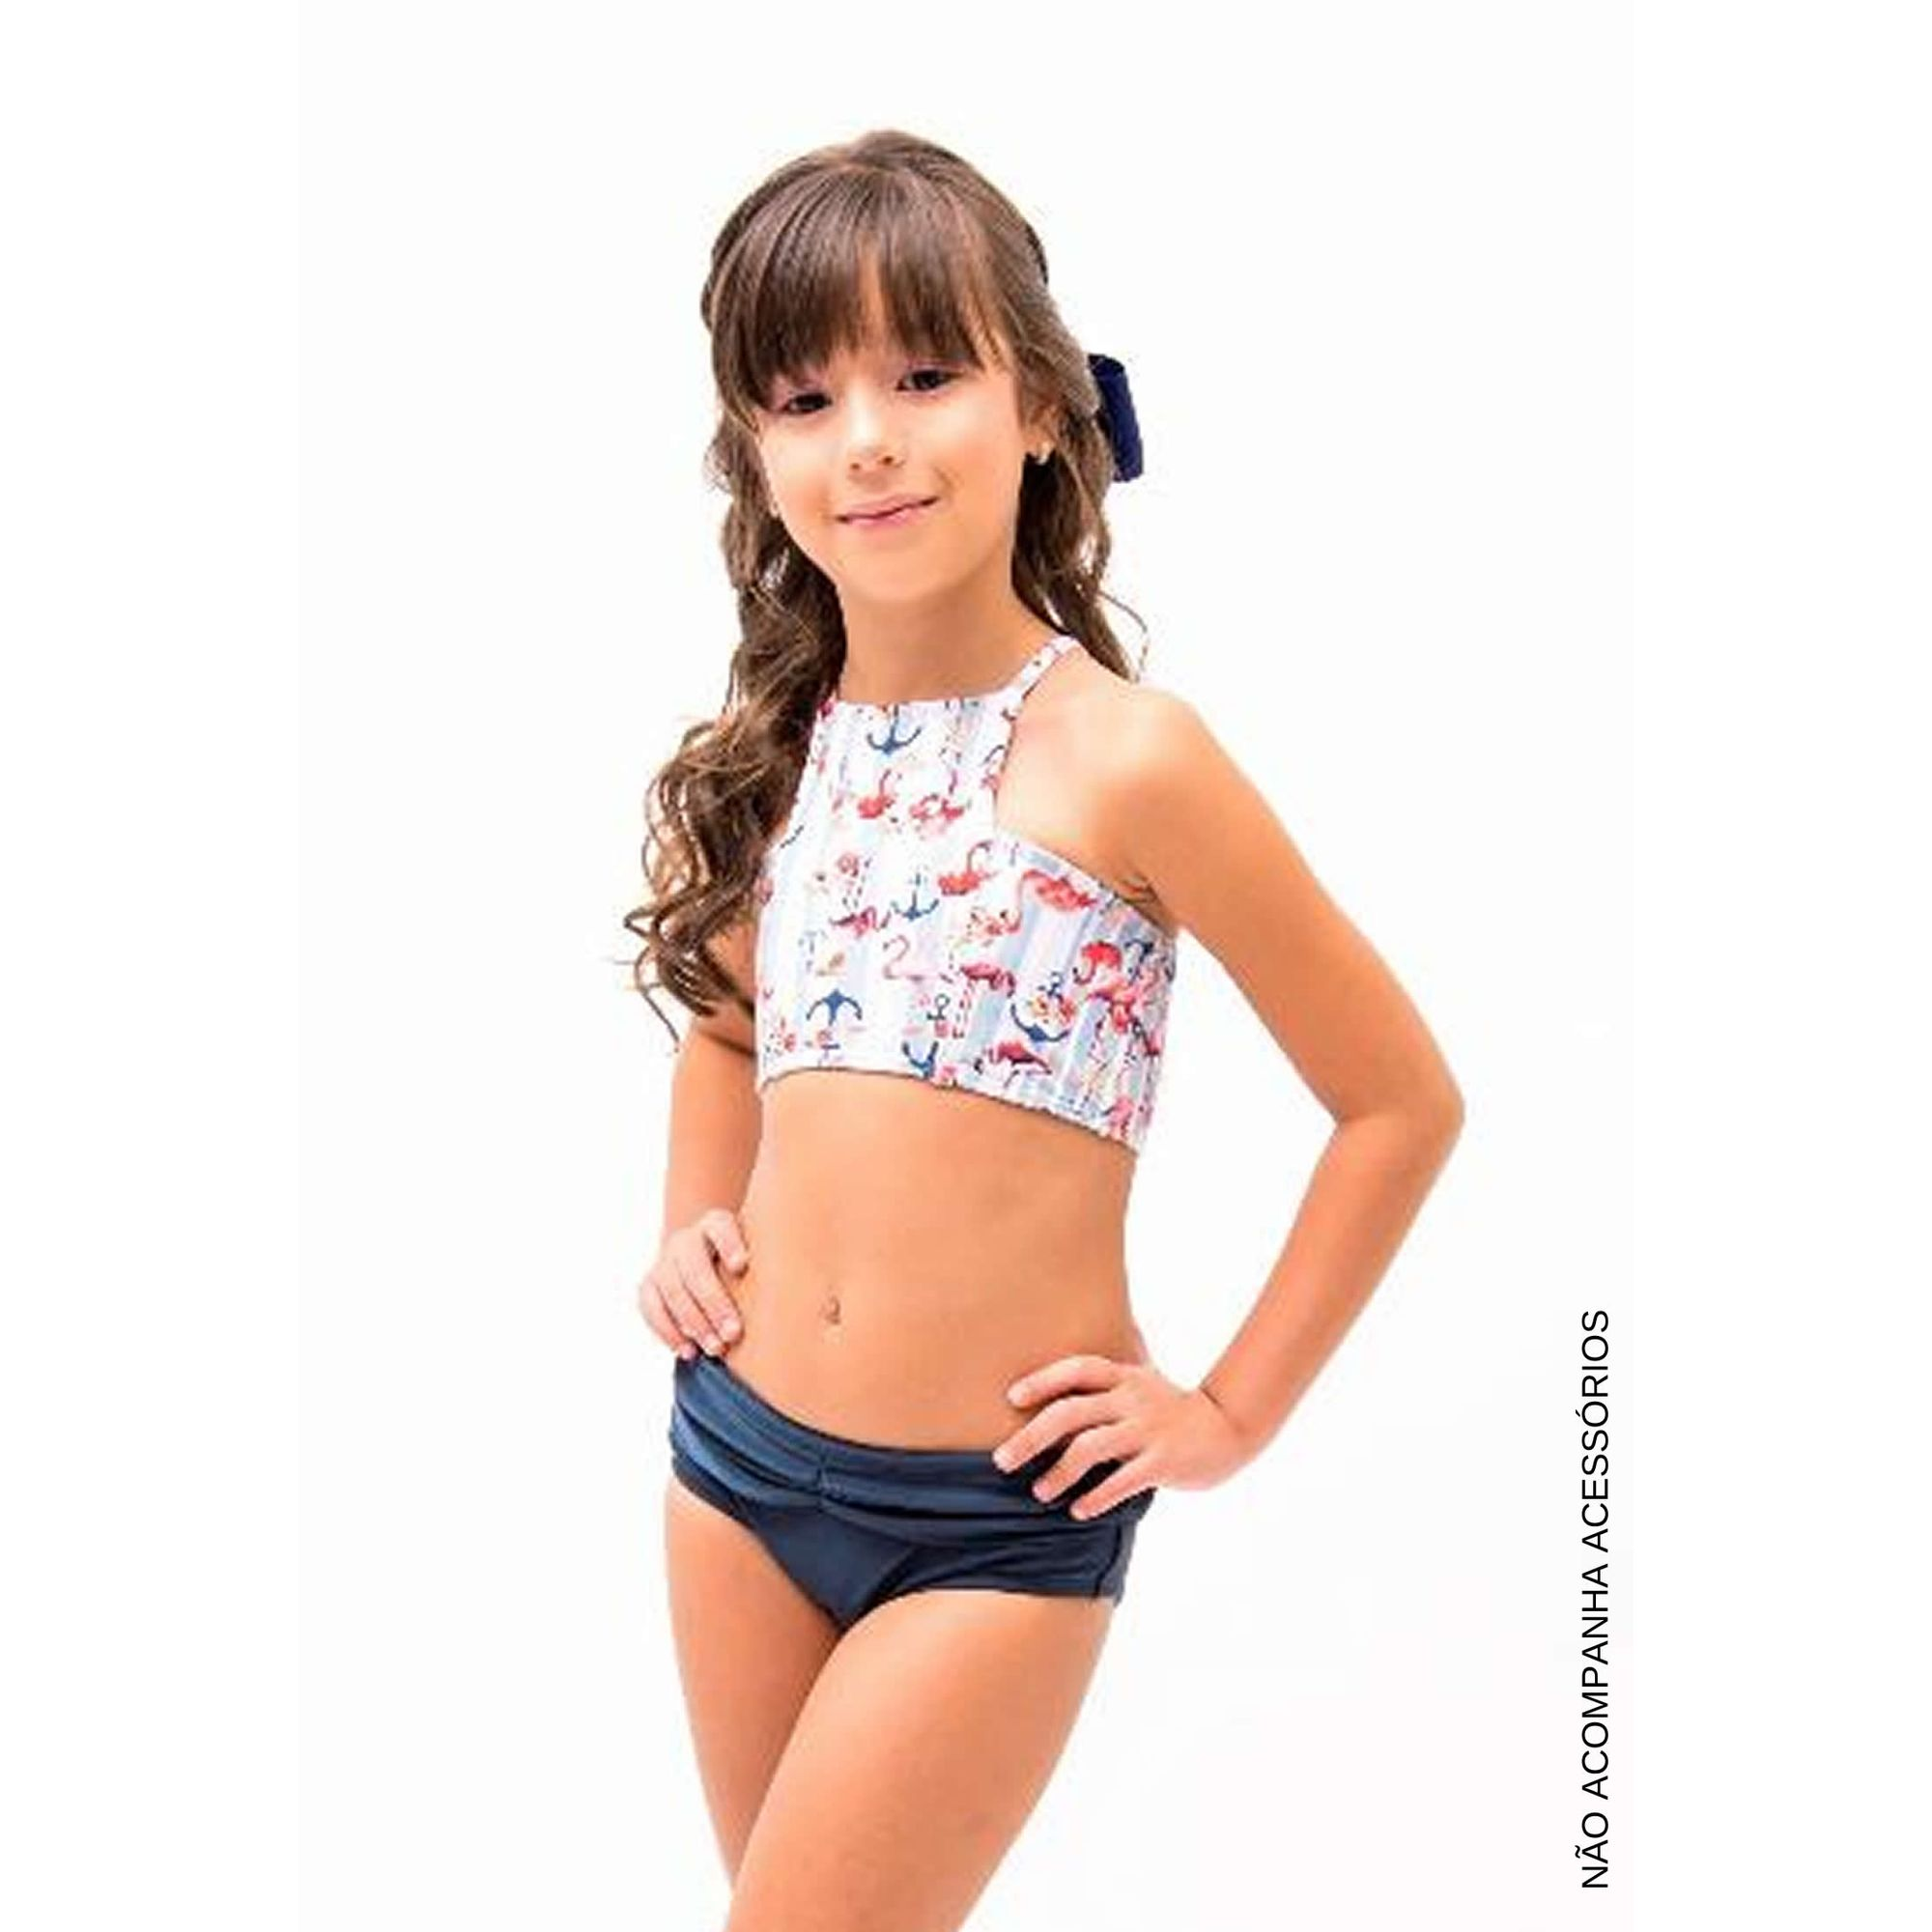 biquini-infantil-top-flamingos-navy-calca-pala-marinho-1